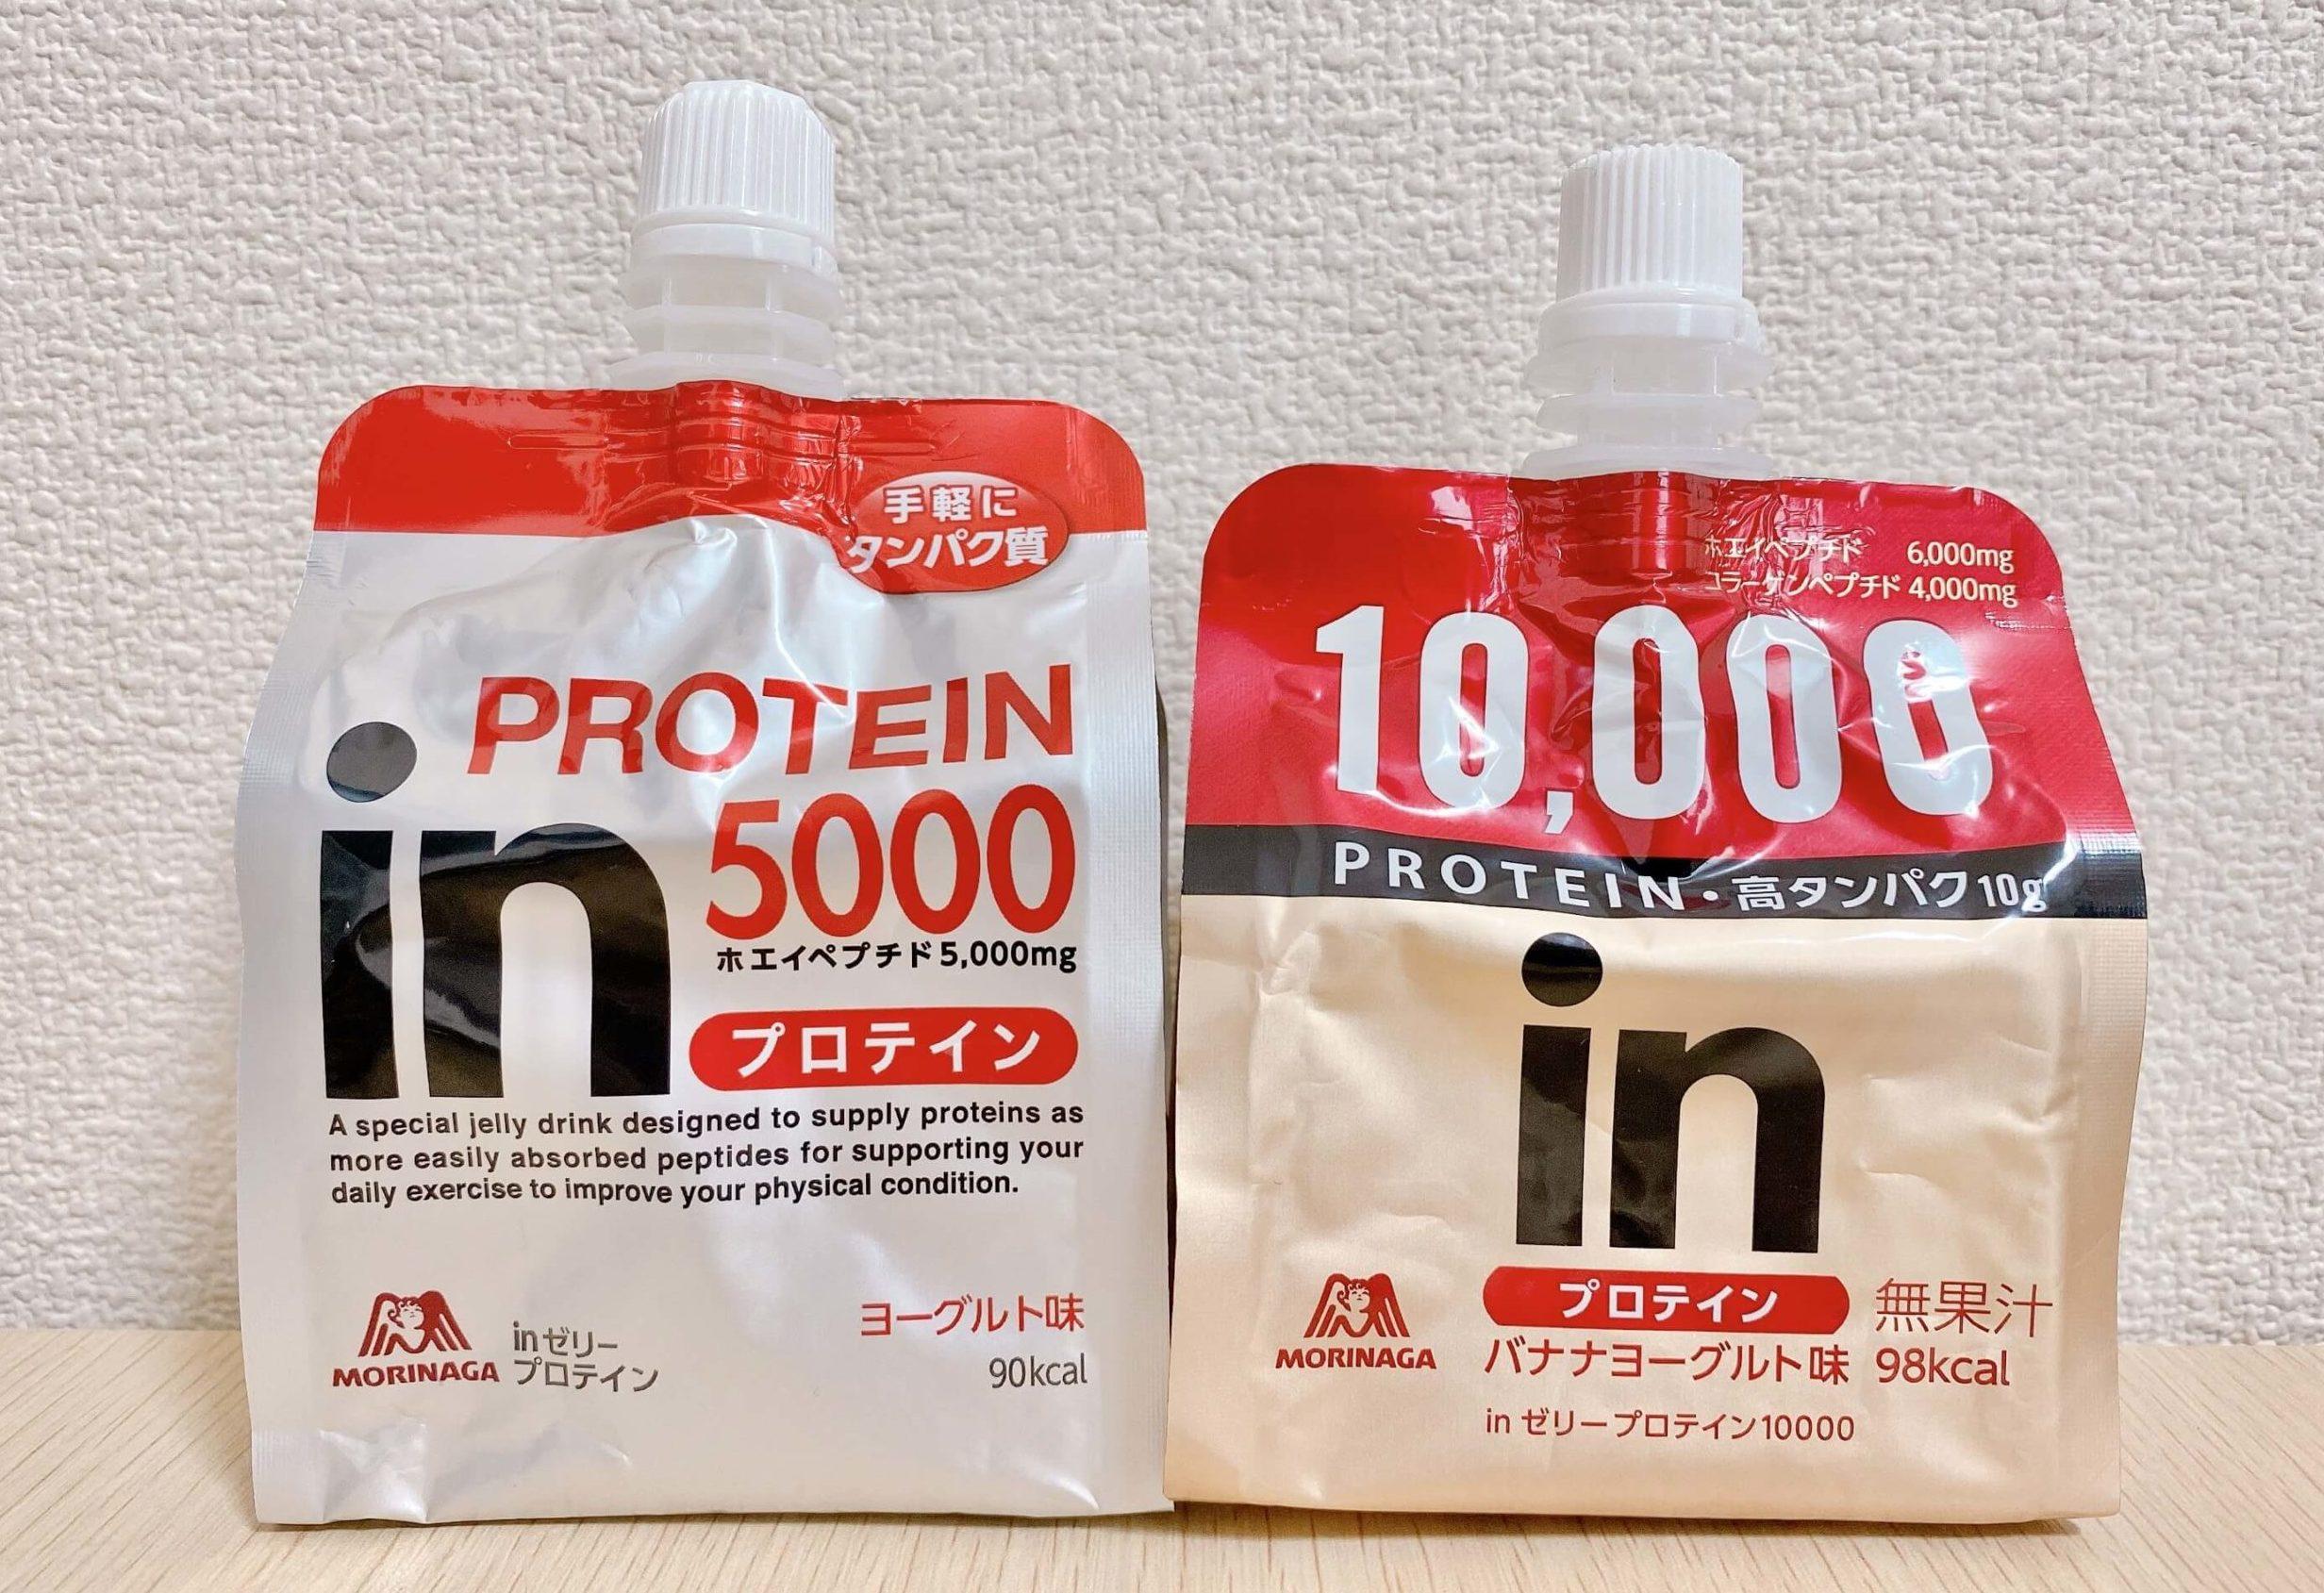 inゼリープロテインとプロテイン10000を成分や味で比較